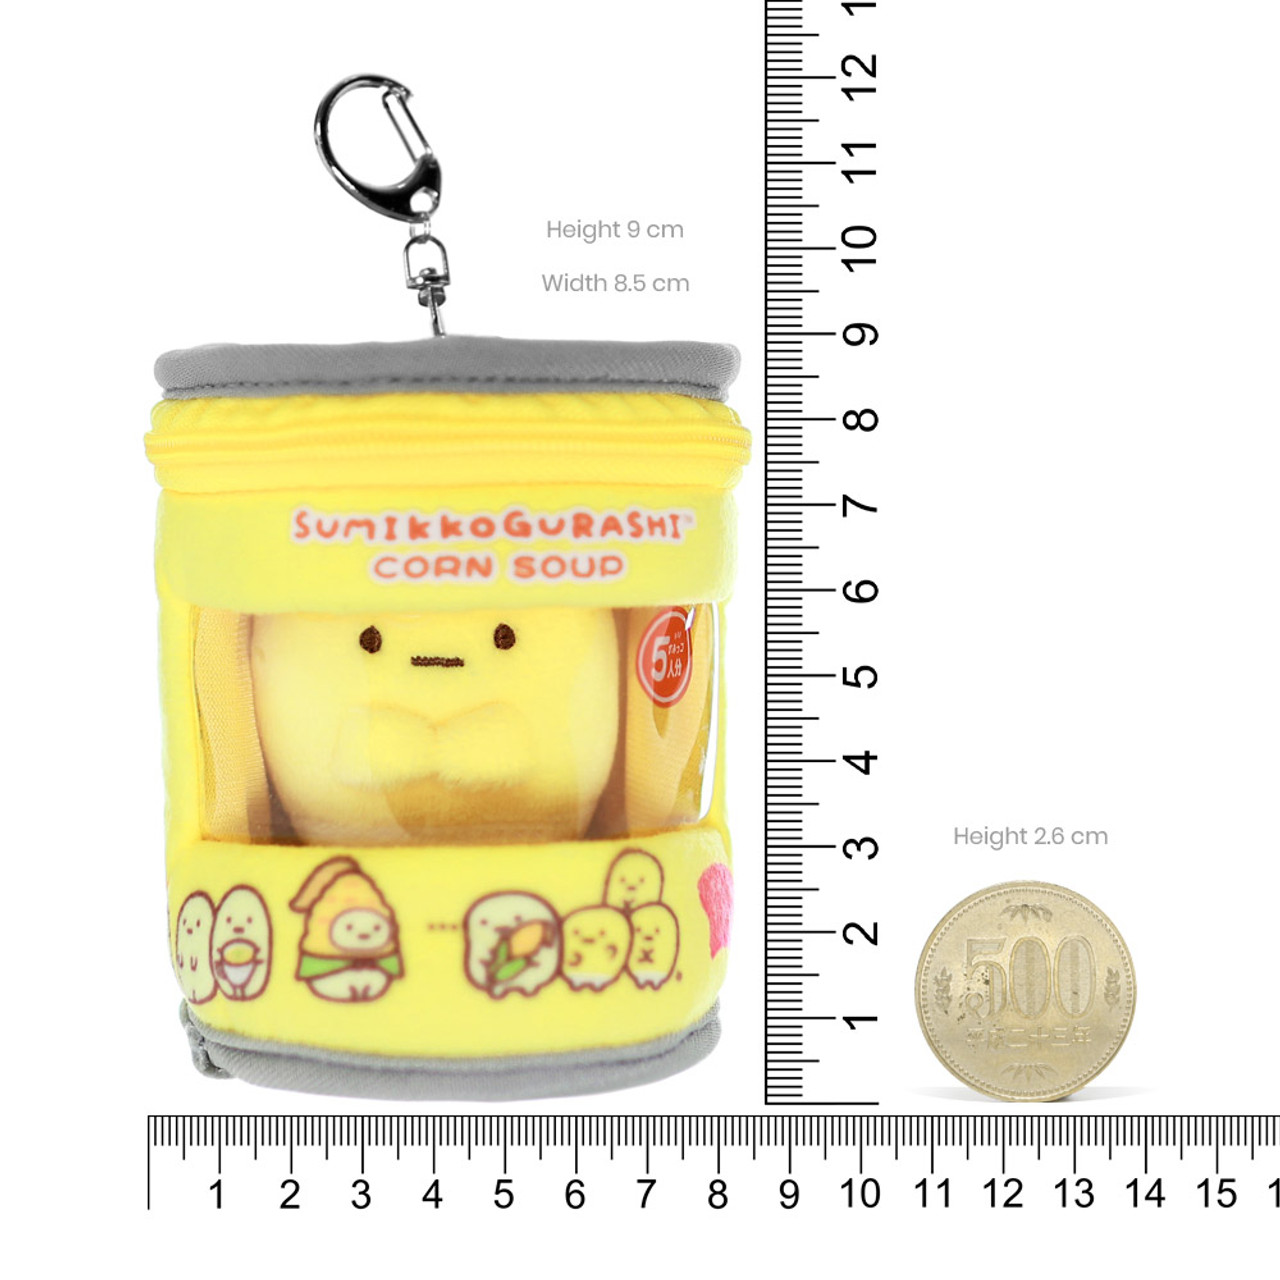 Sumikko Gurashi Premium Corn Can Plush keychain Charm ( Proportion )